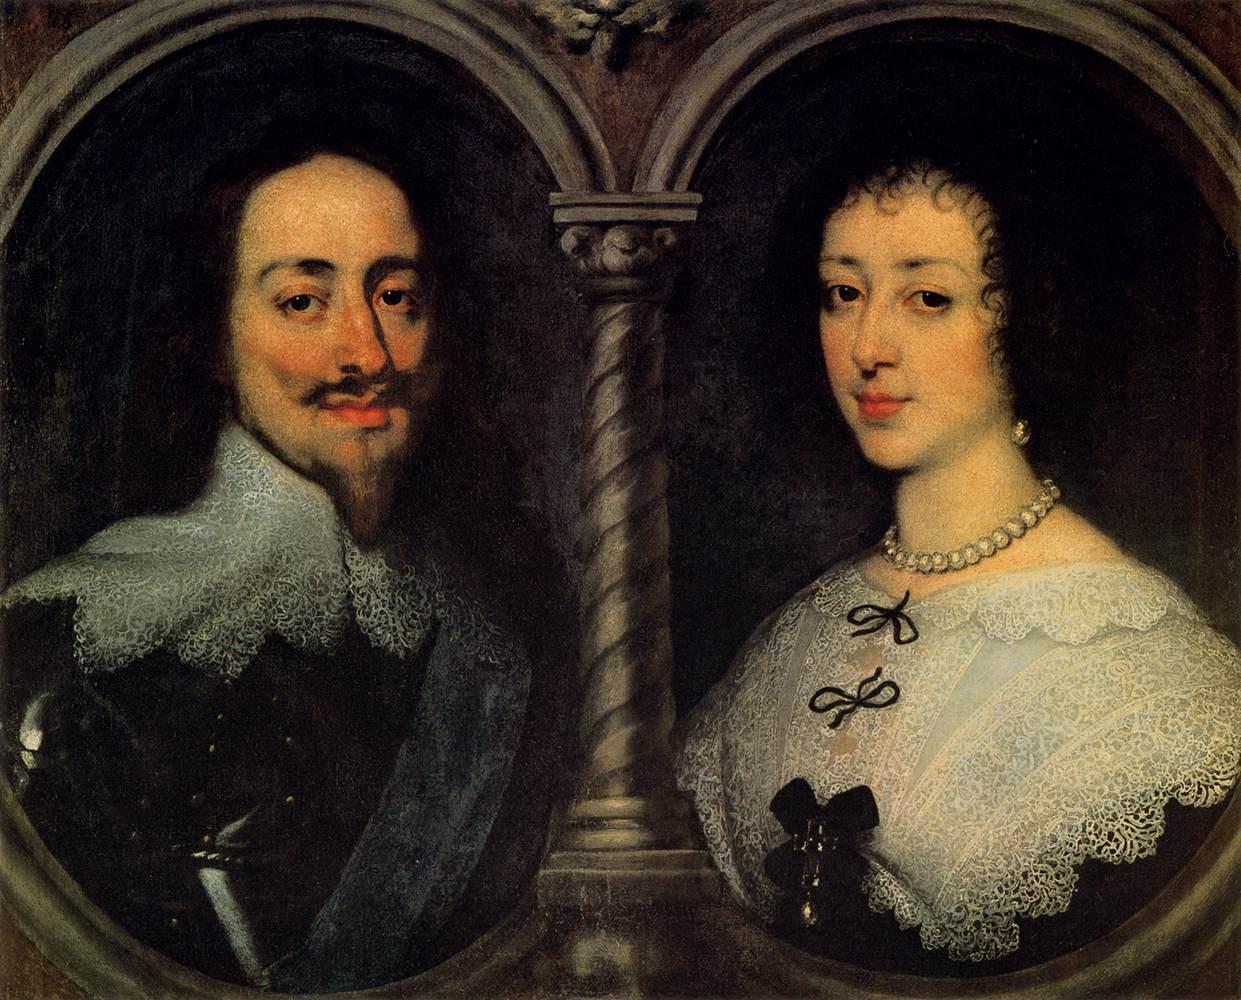 Salvator Mundi Van Leonardo Da Vinci >> File:Anthony van Dyck - Charles I of England and Henrietta of France - WGA07409.jpg - Wikimedia ...